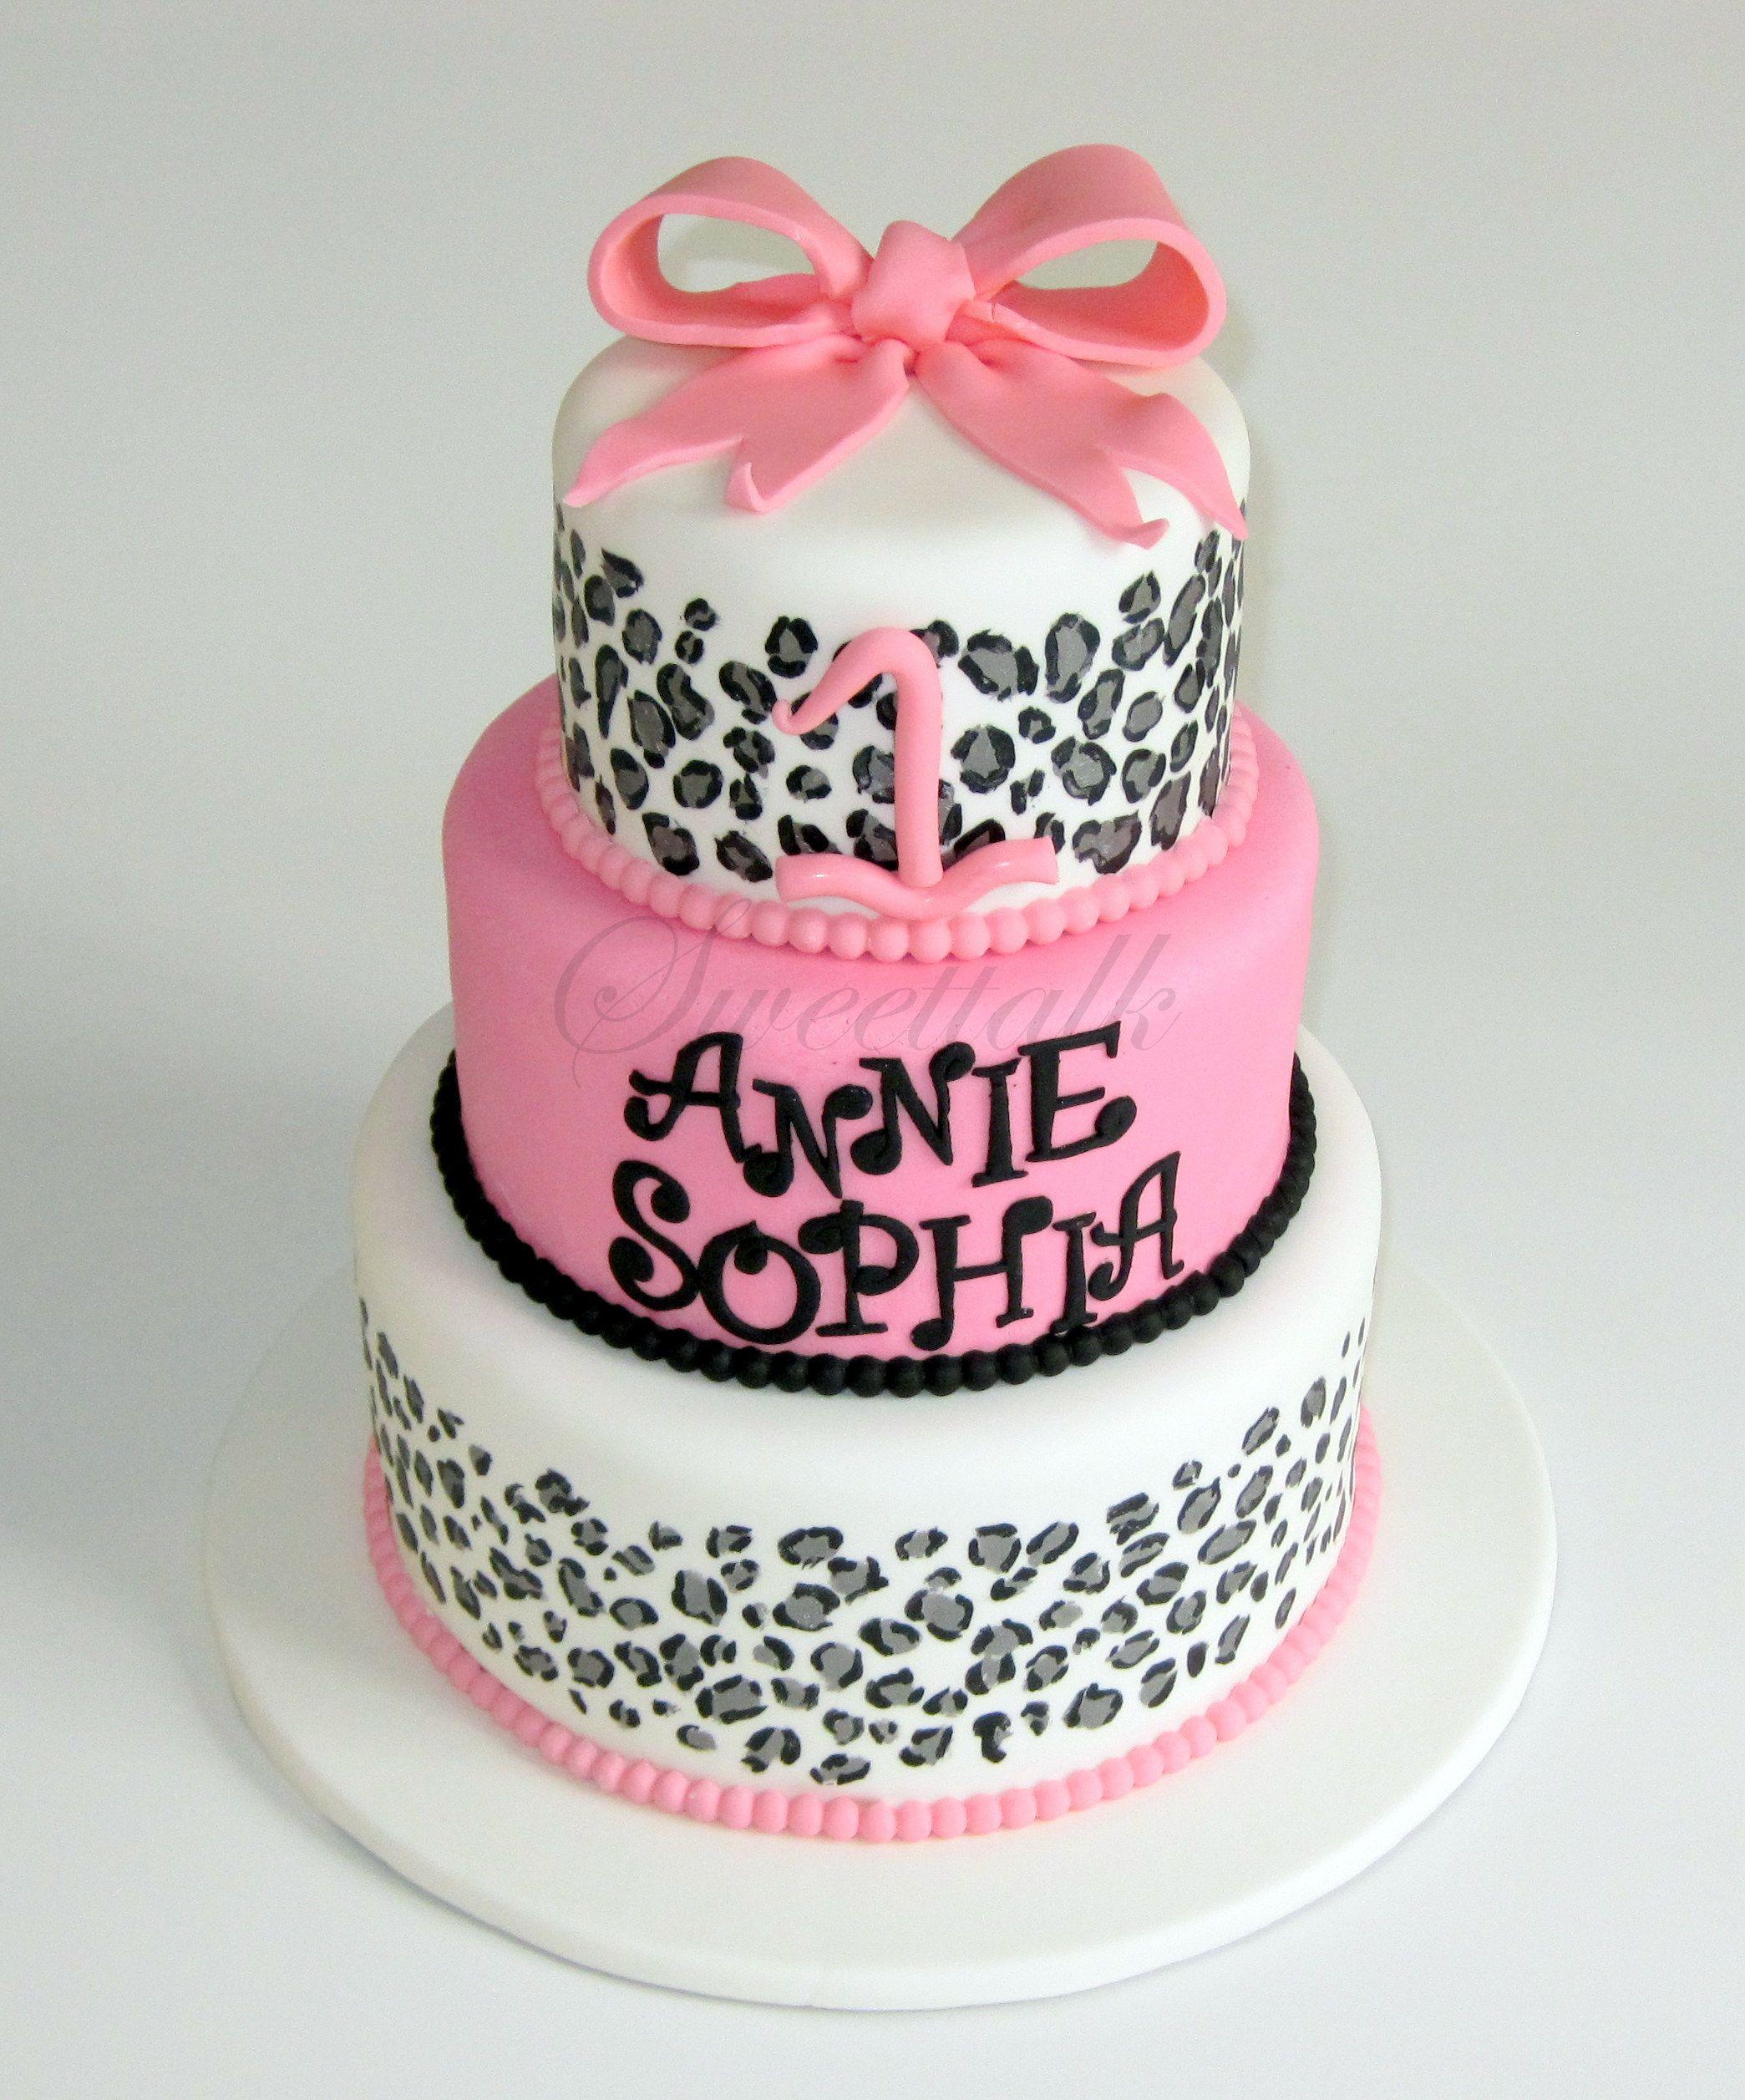 Cake Art Printer : Leopard print cake, Cheetah cake, Animal print cake ...